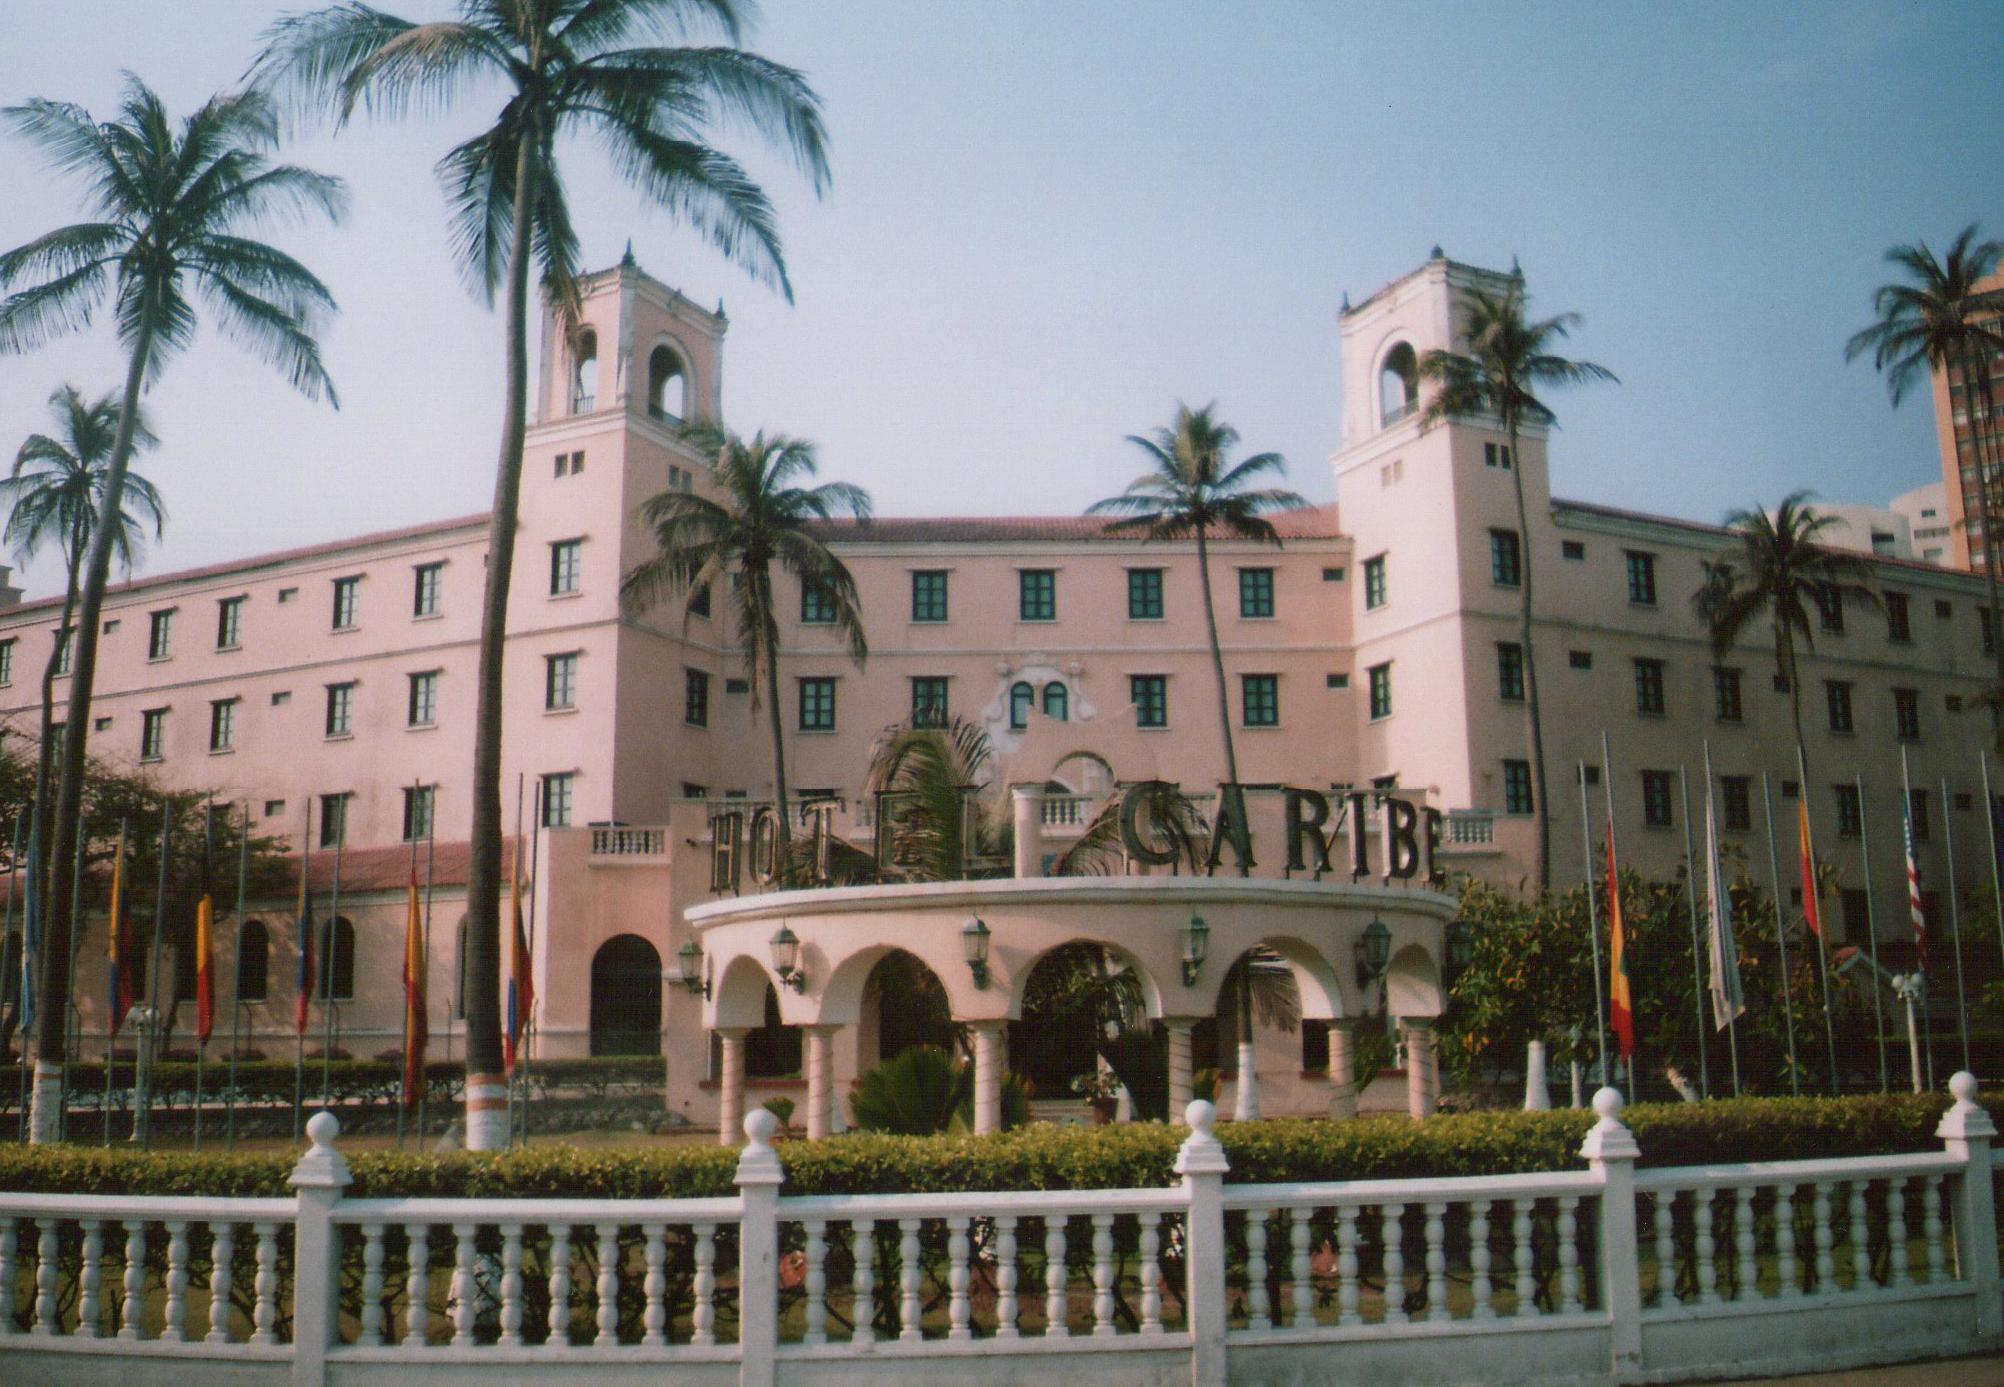 File:Hotel Caribe Cartagena.jpg - Wikimedia Commons